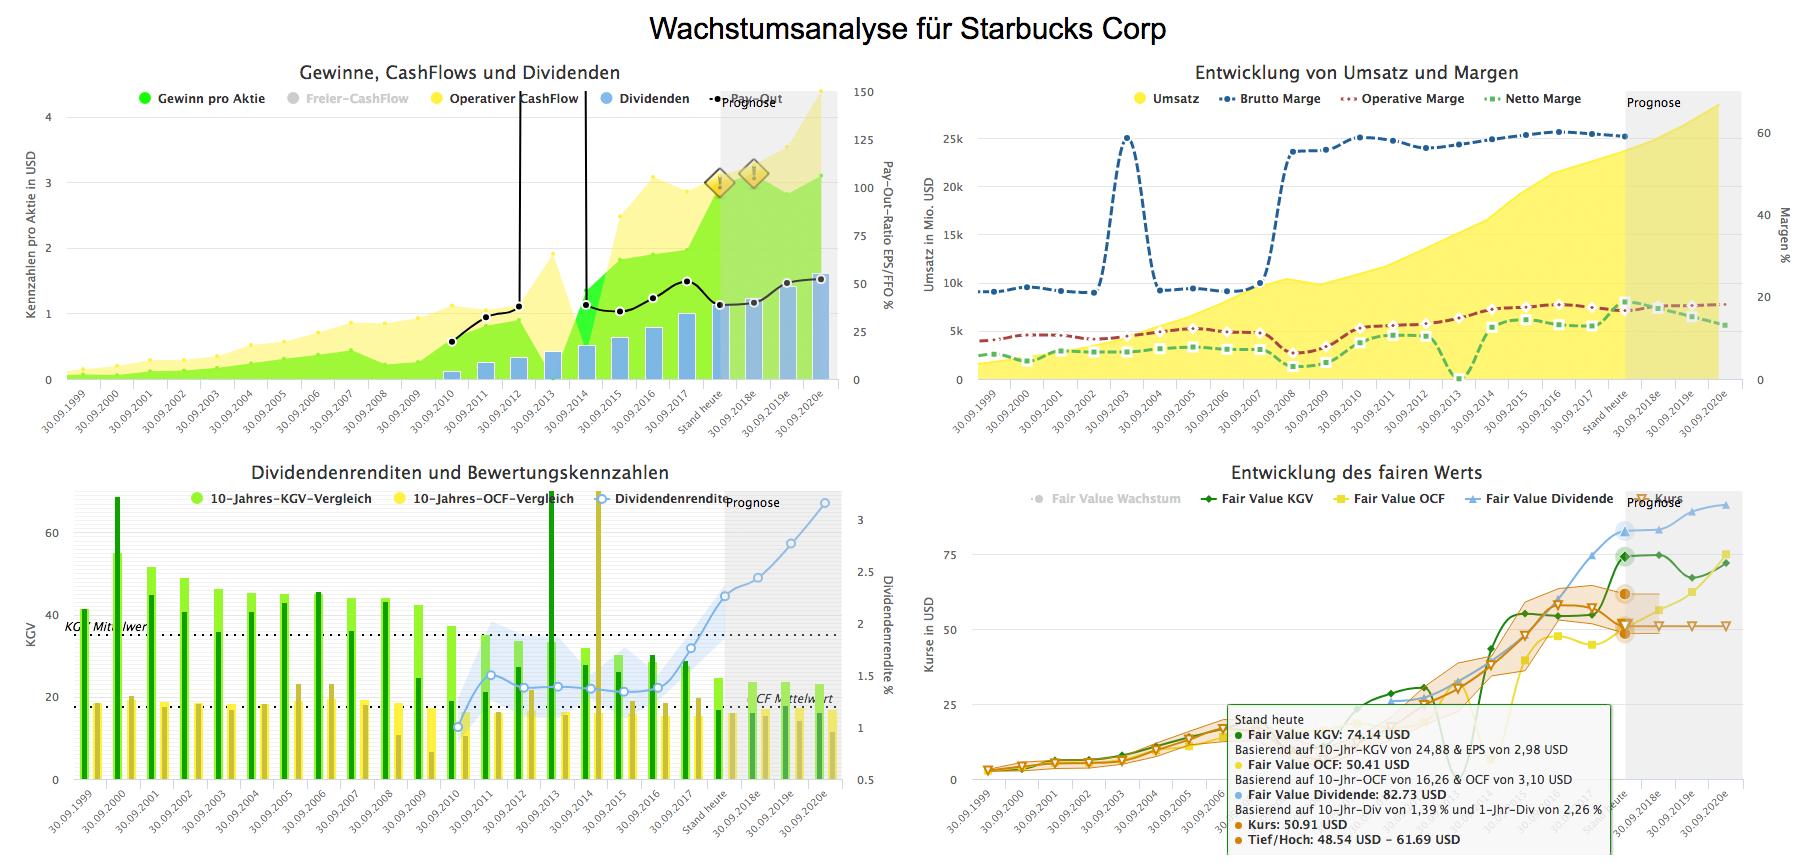 Wachstumsanalyse-Starbucks-Corp-juli-2018